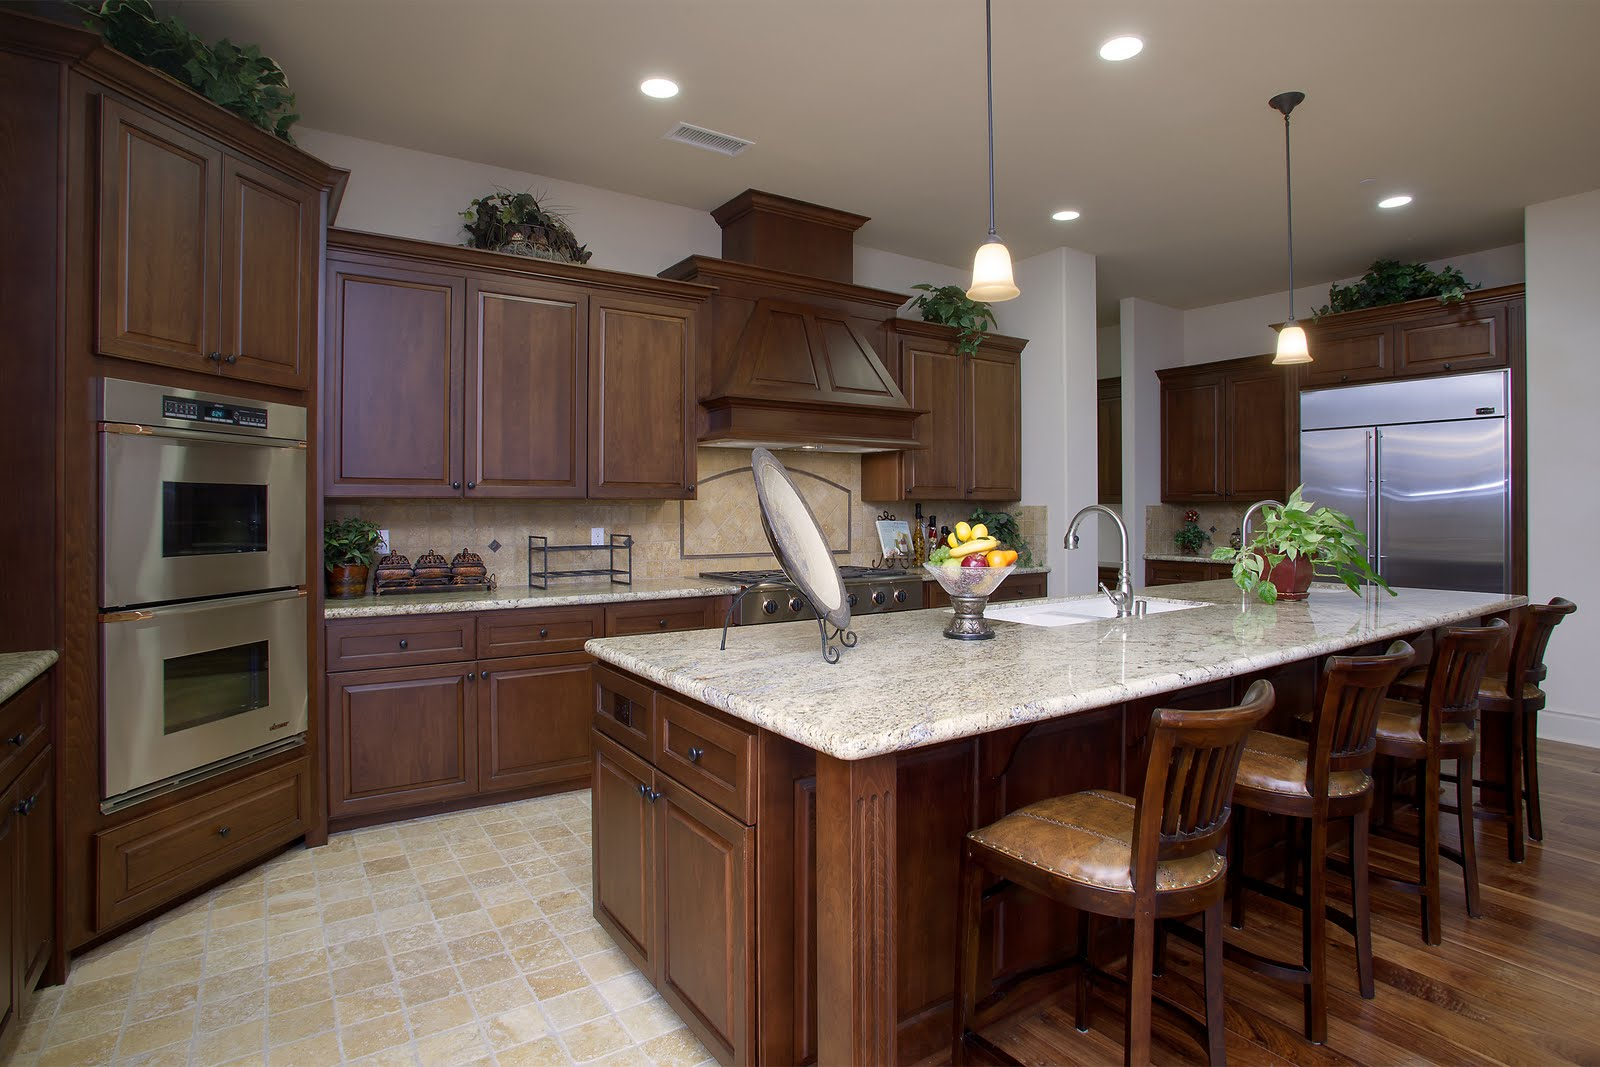 25 Inspirational House Kitchen Models - HOME DECOR VIRAL NEWS on Model Kitchen Ideas  id=38187